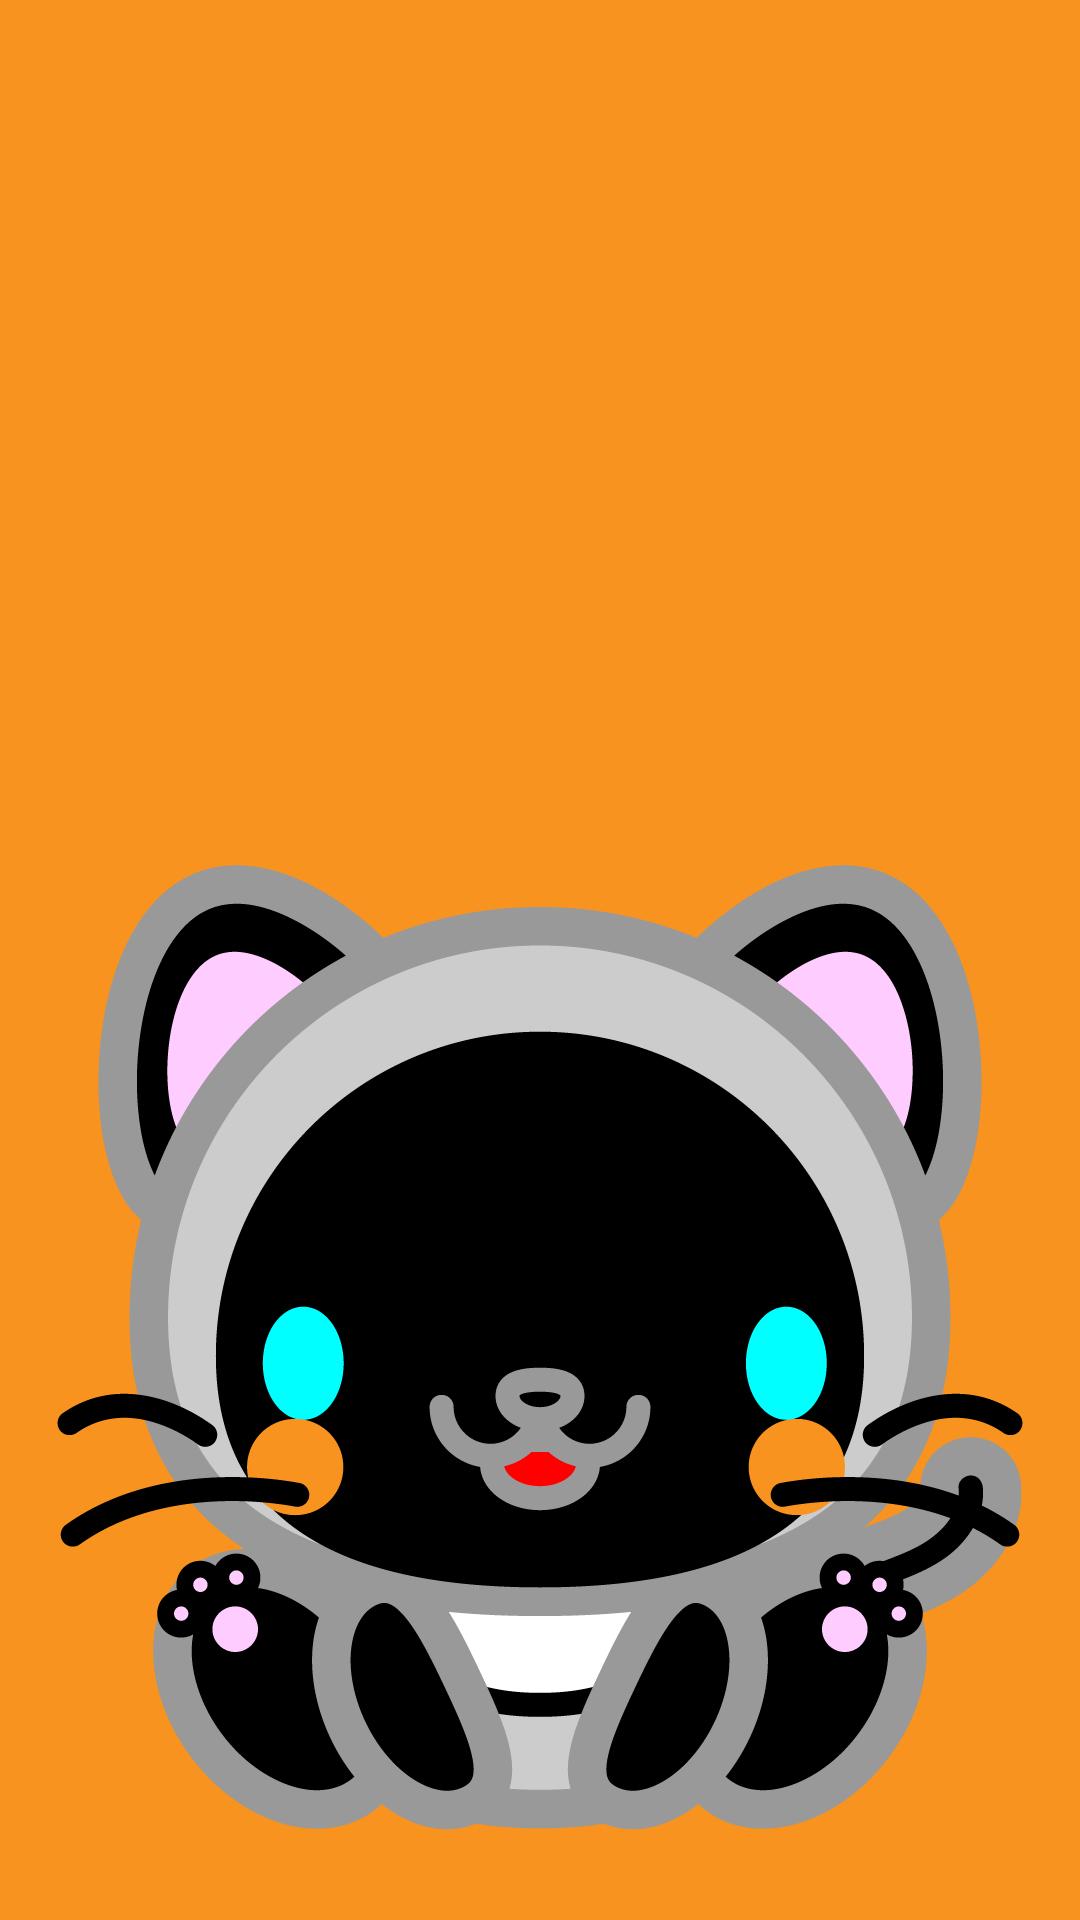 wallpaper4_sitsiamesecat-orange-iphone